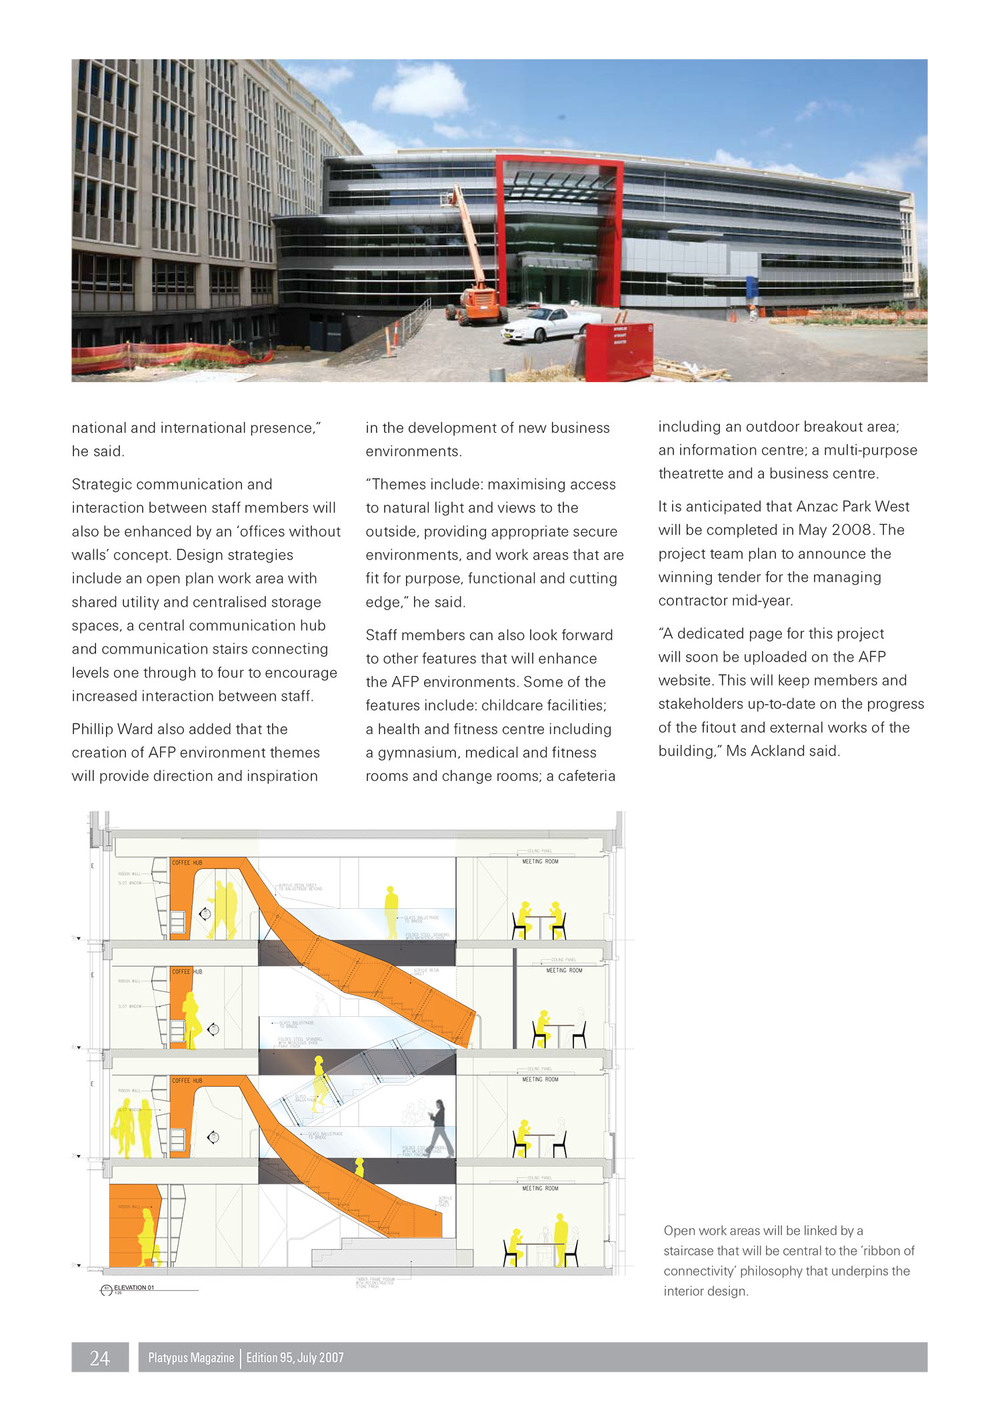 Public_Realm_Lab_Platypus_2007_Page_24.jpg